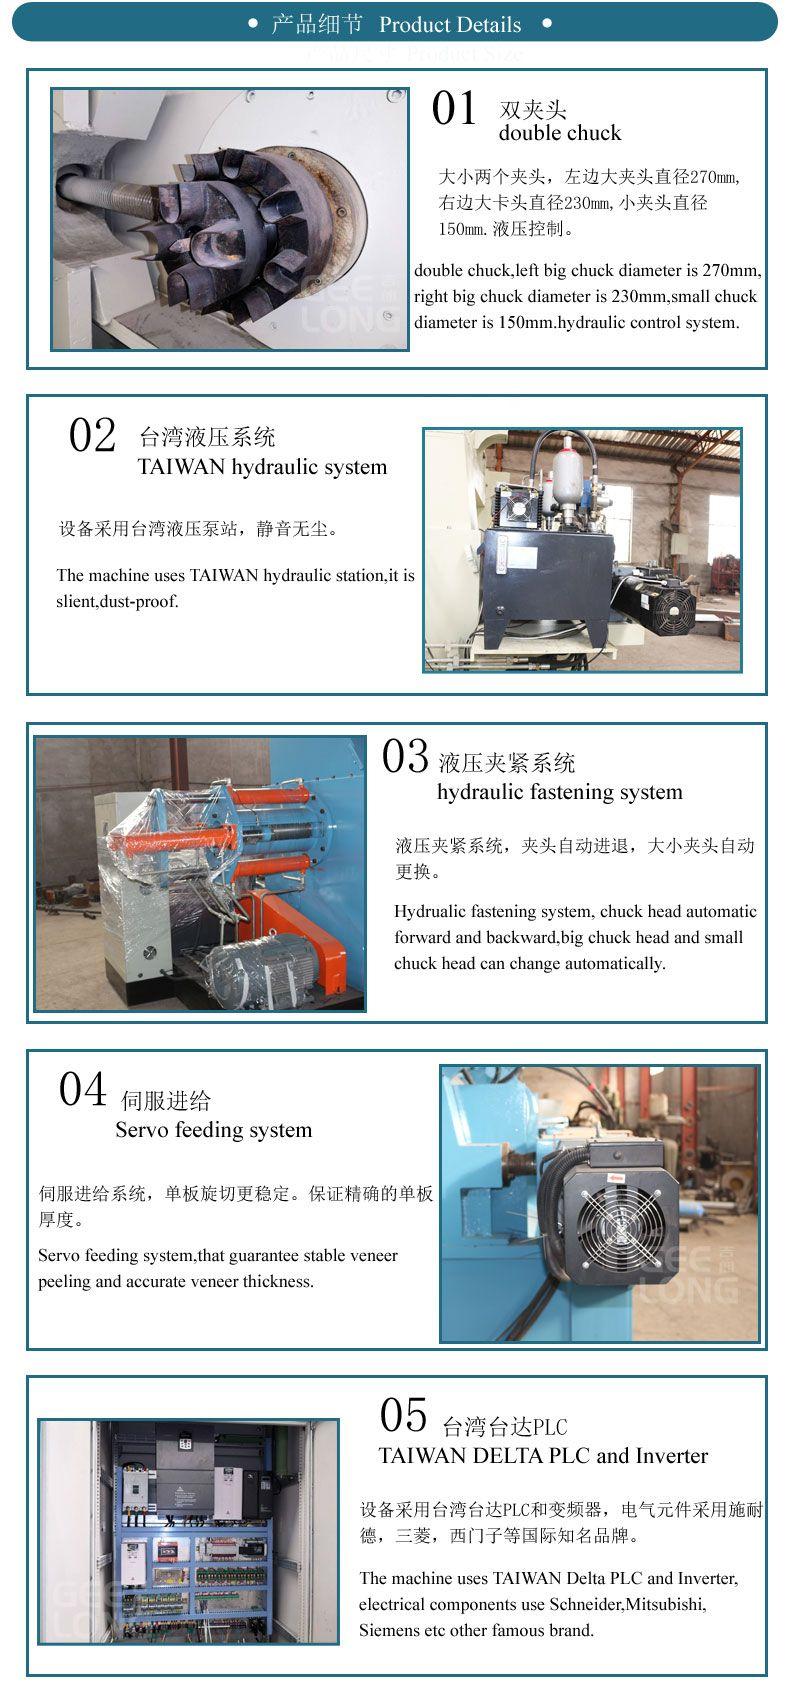 hydraulic 1300mm double chuck spindle veneer peeling machine